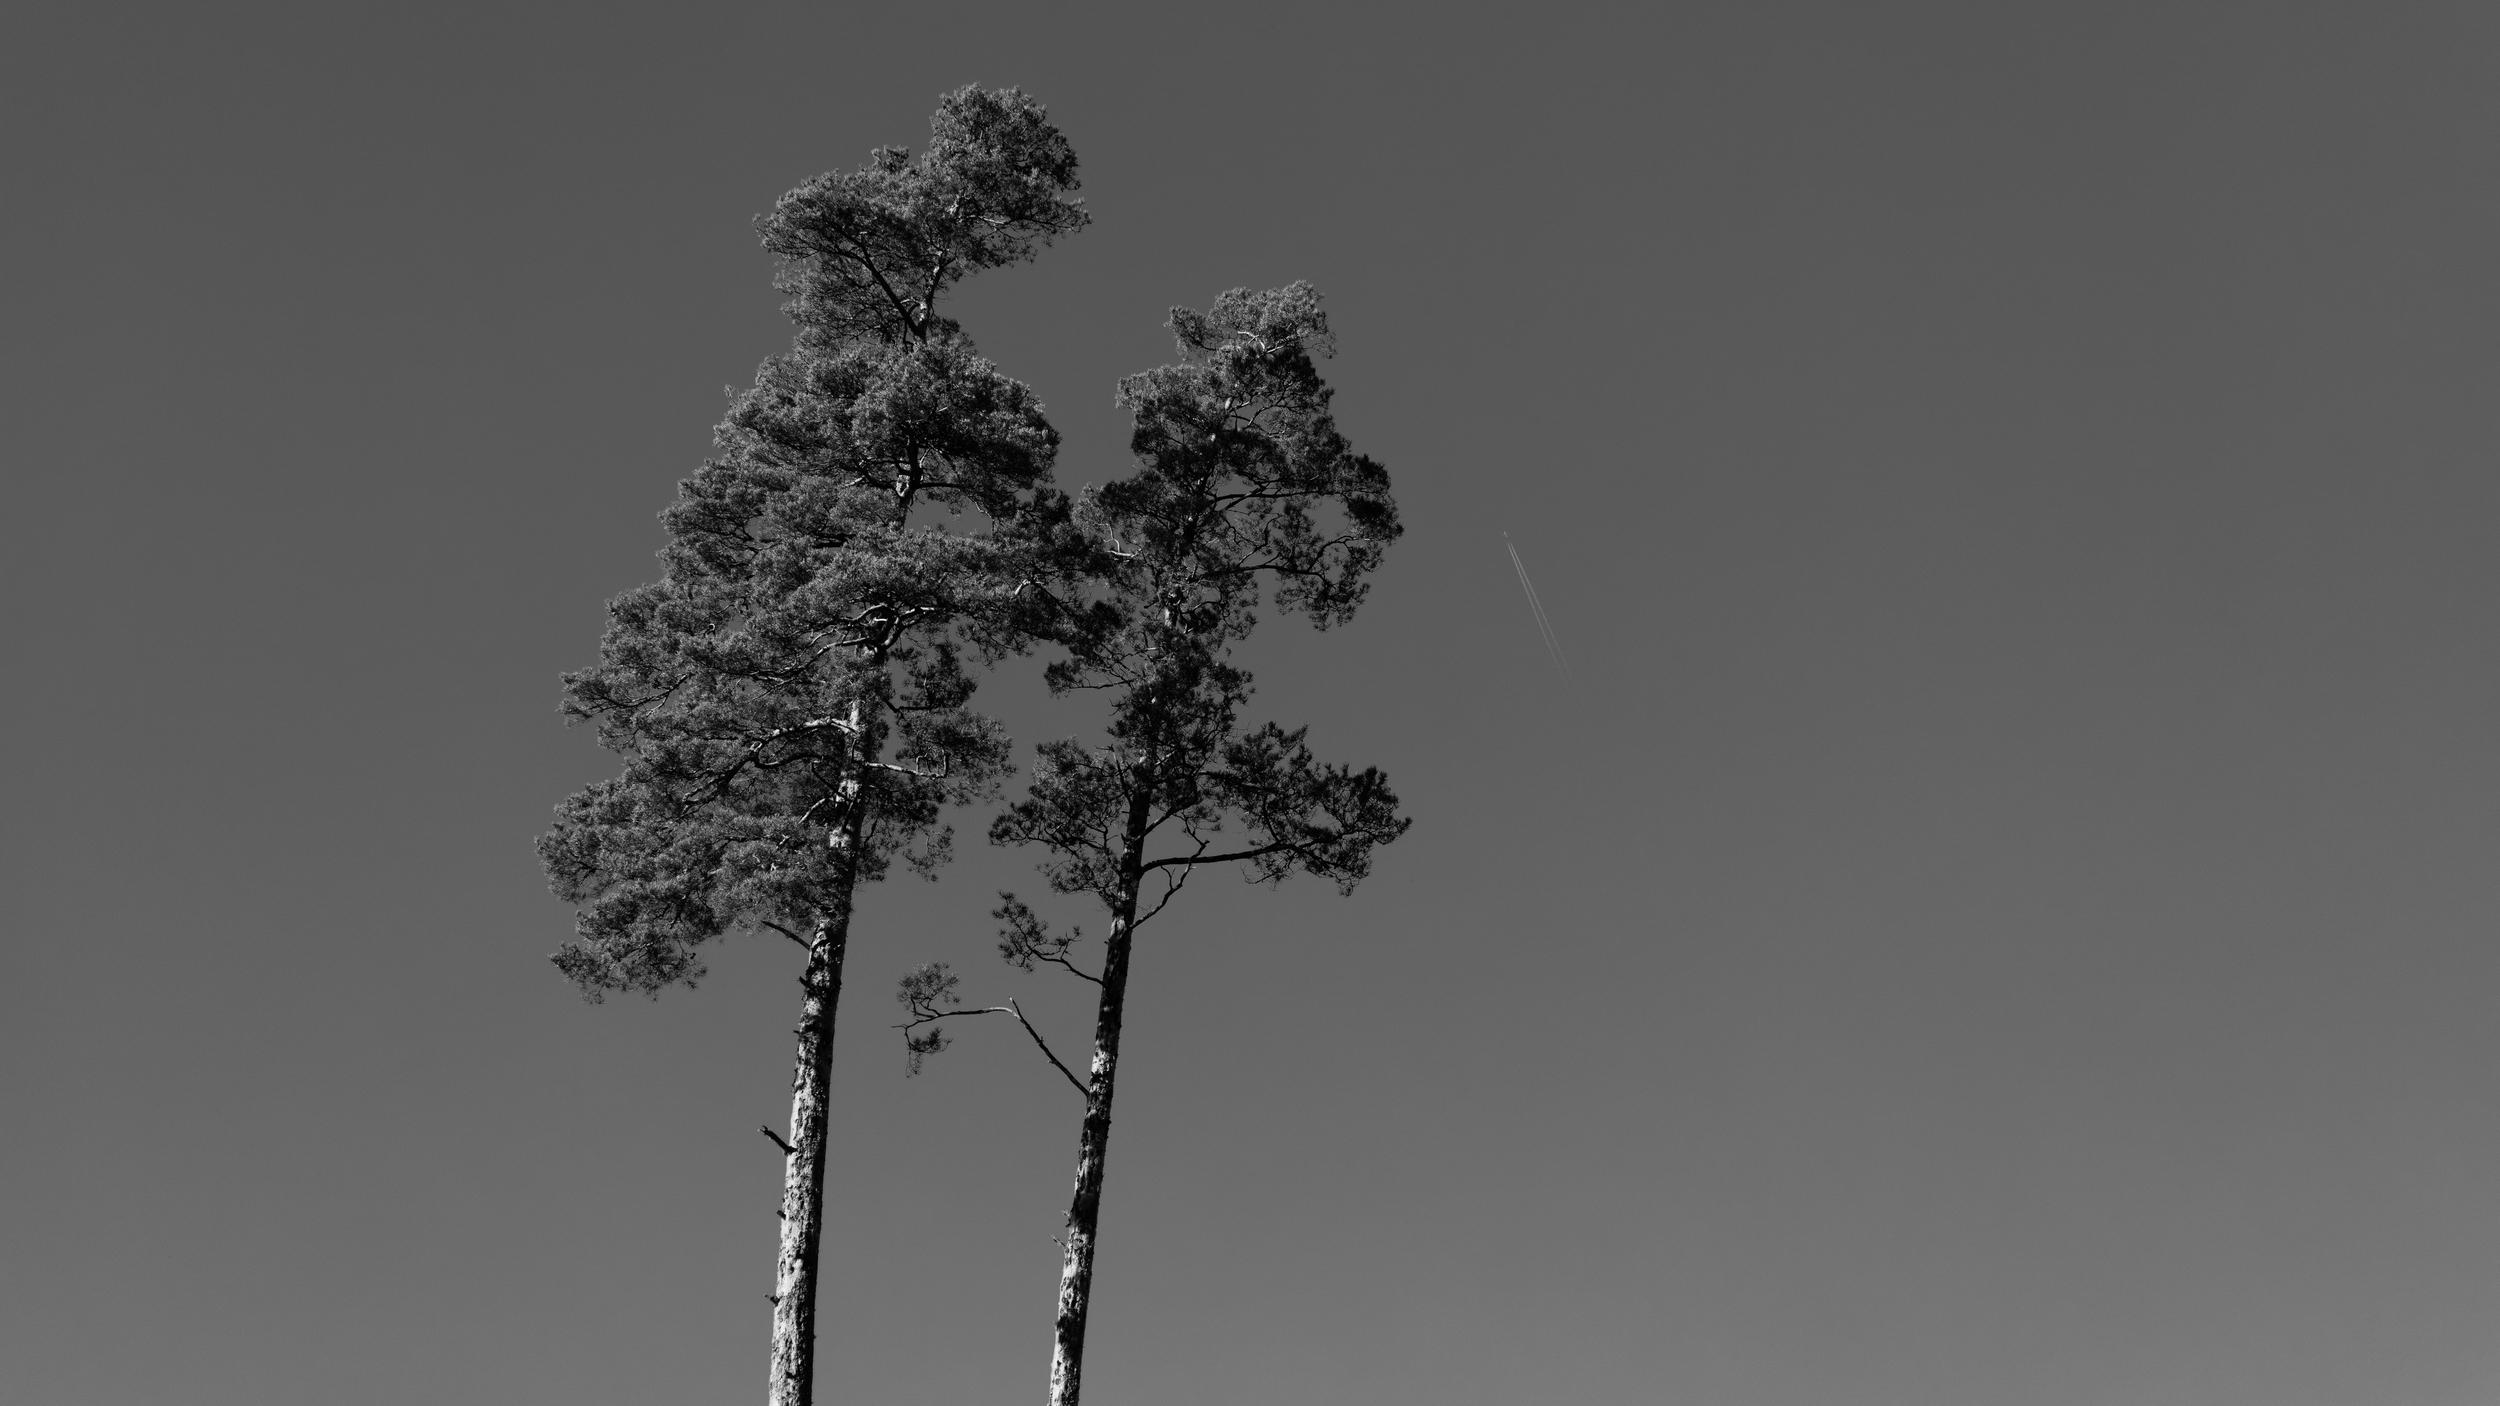 Barndomens träd